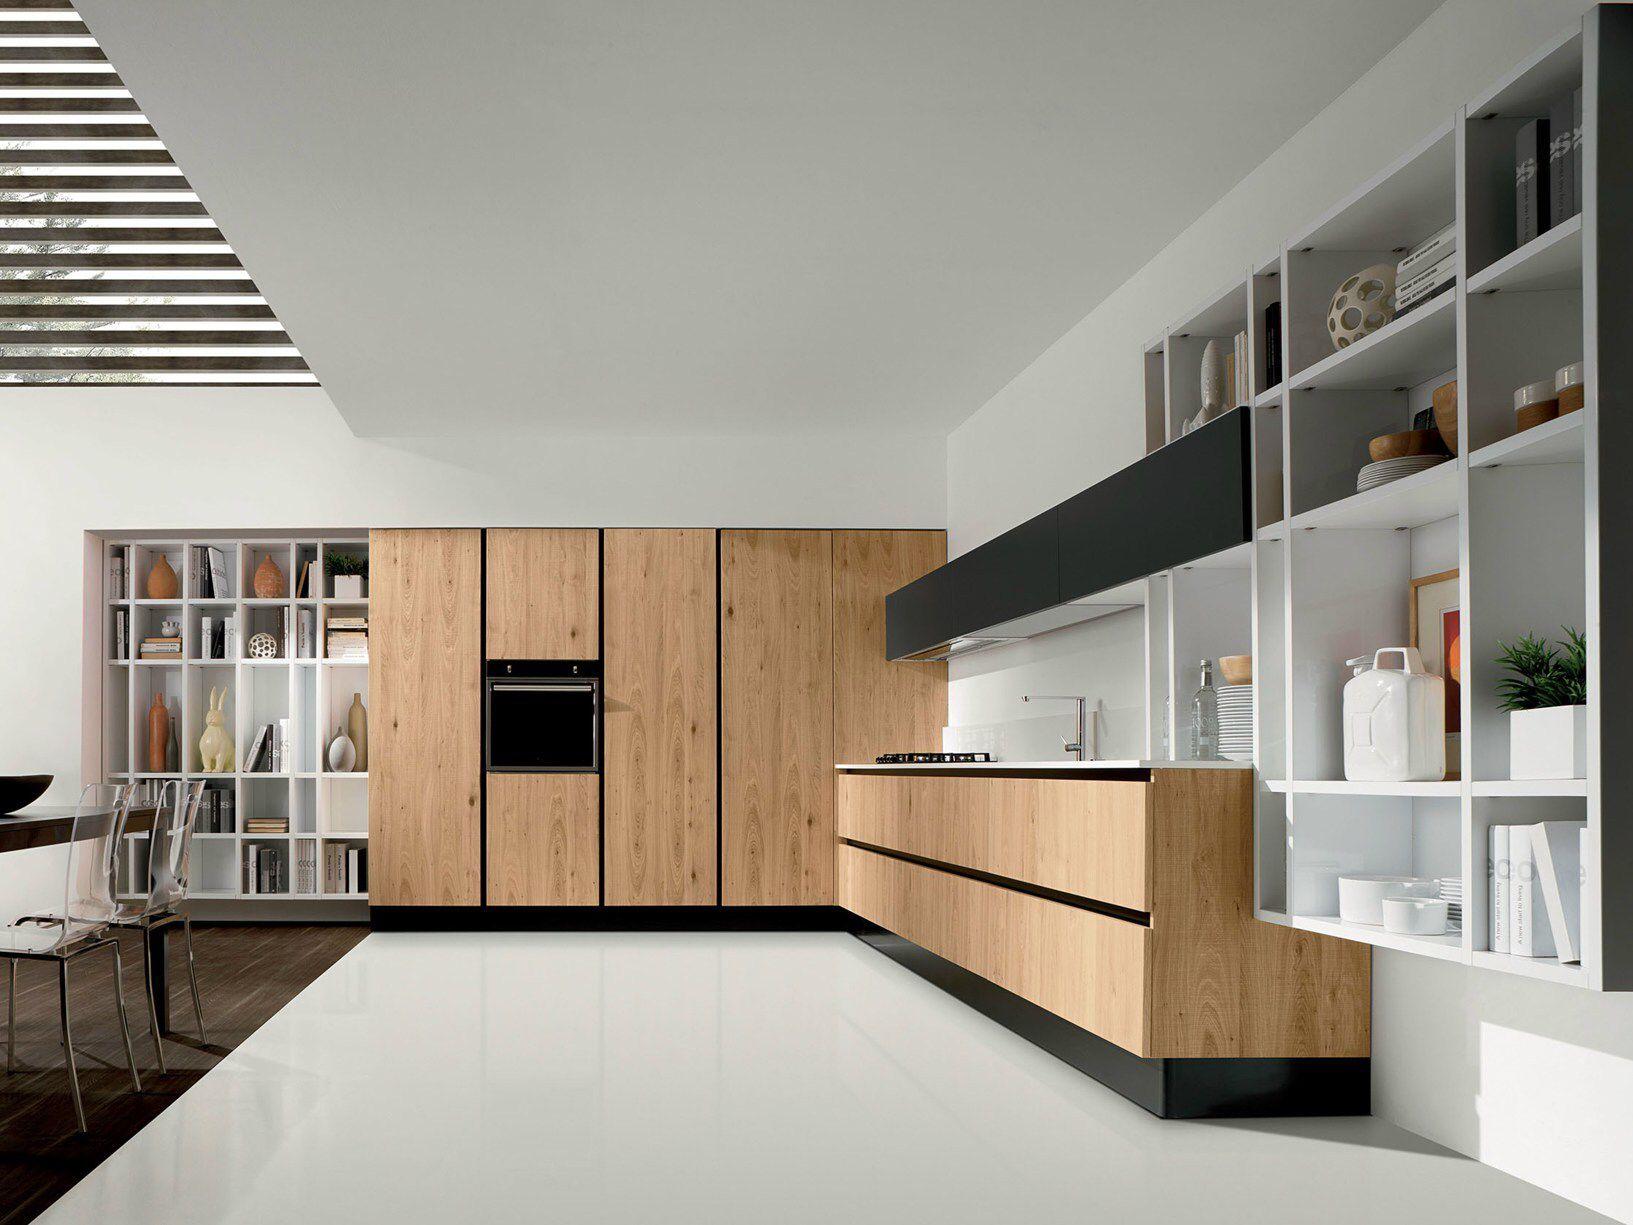 Aran Cucine Volare | Interior | Pinterest | Interiors and Kitchens